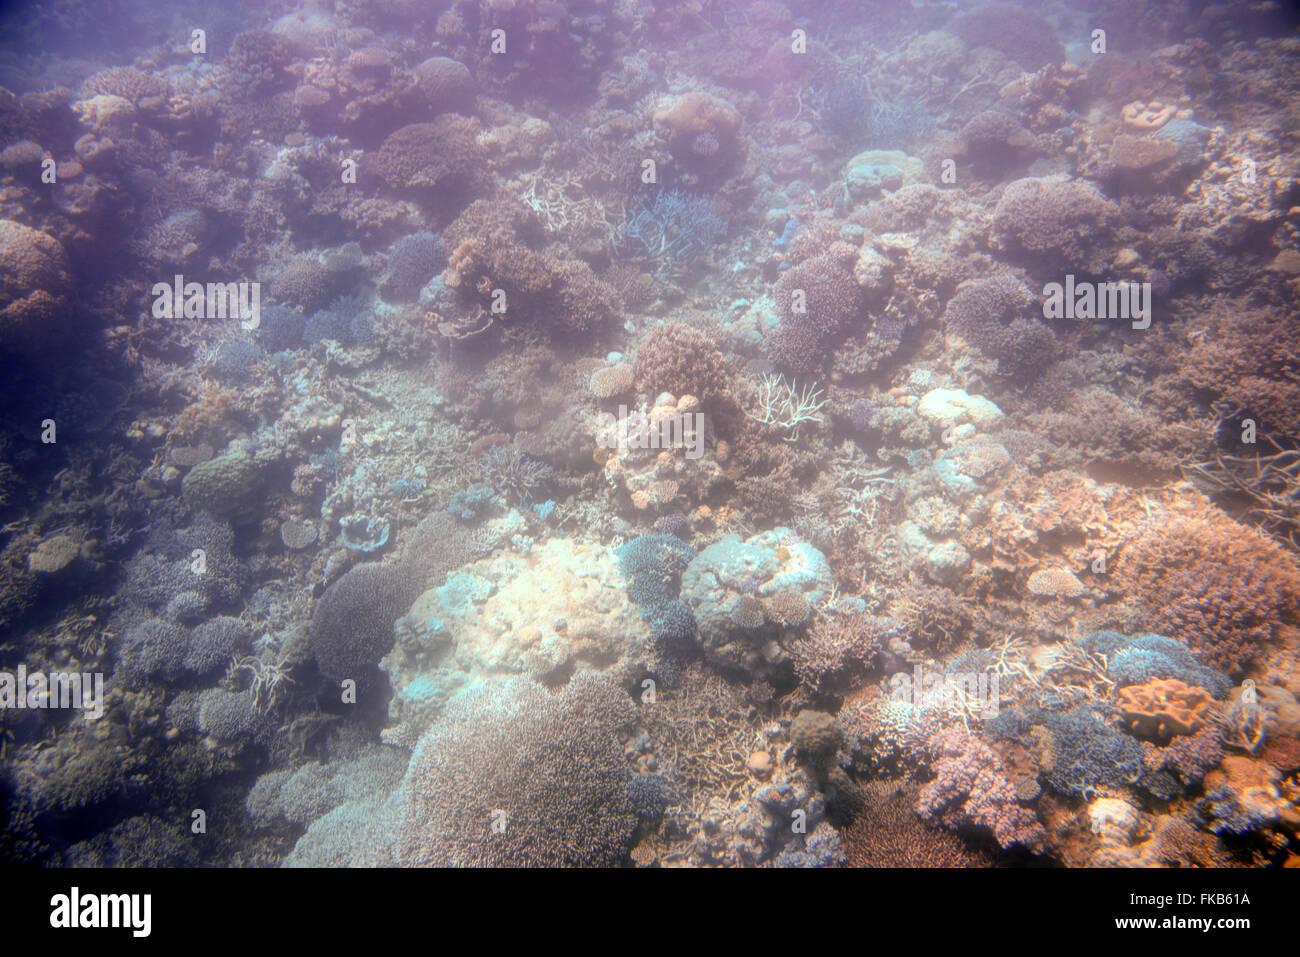 Great Barrier Reef, Queensland, Australia, Agincourt Reefs, UNESCO World Heritage List, commercialism, tourism, - Stock Image